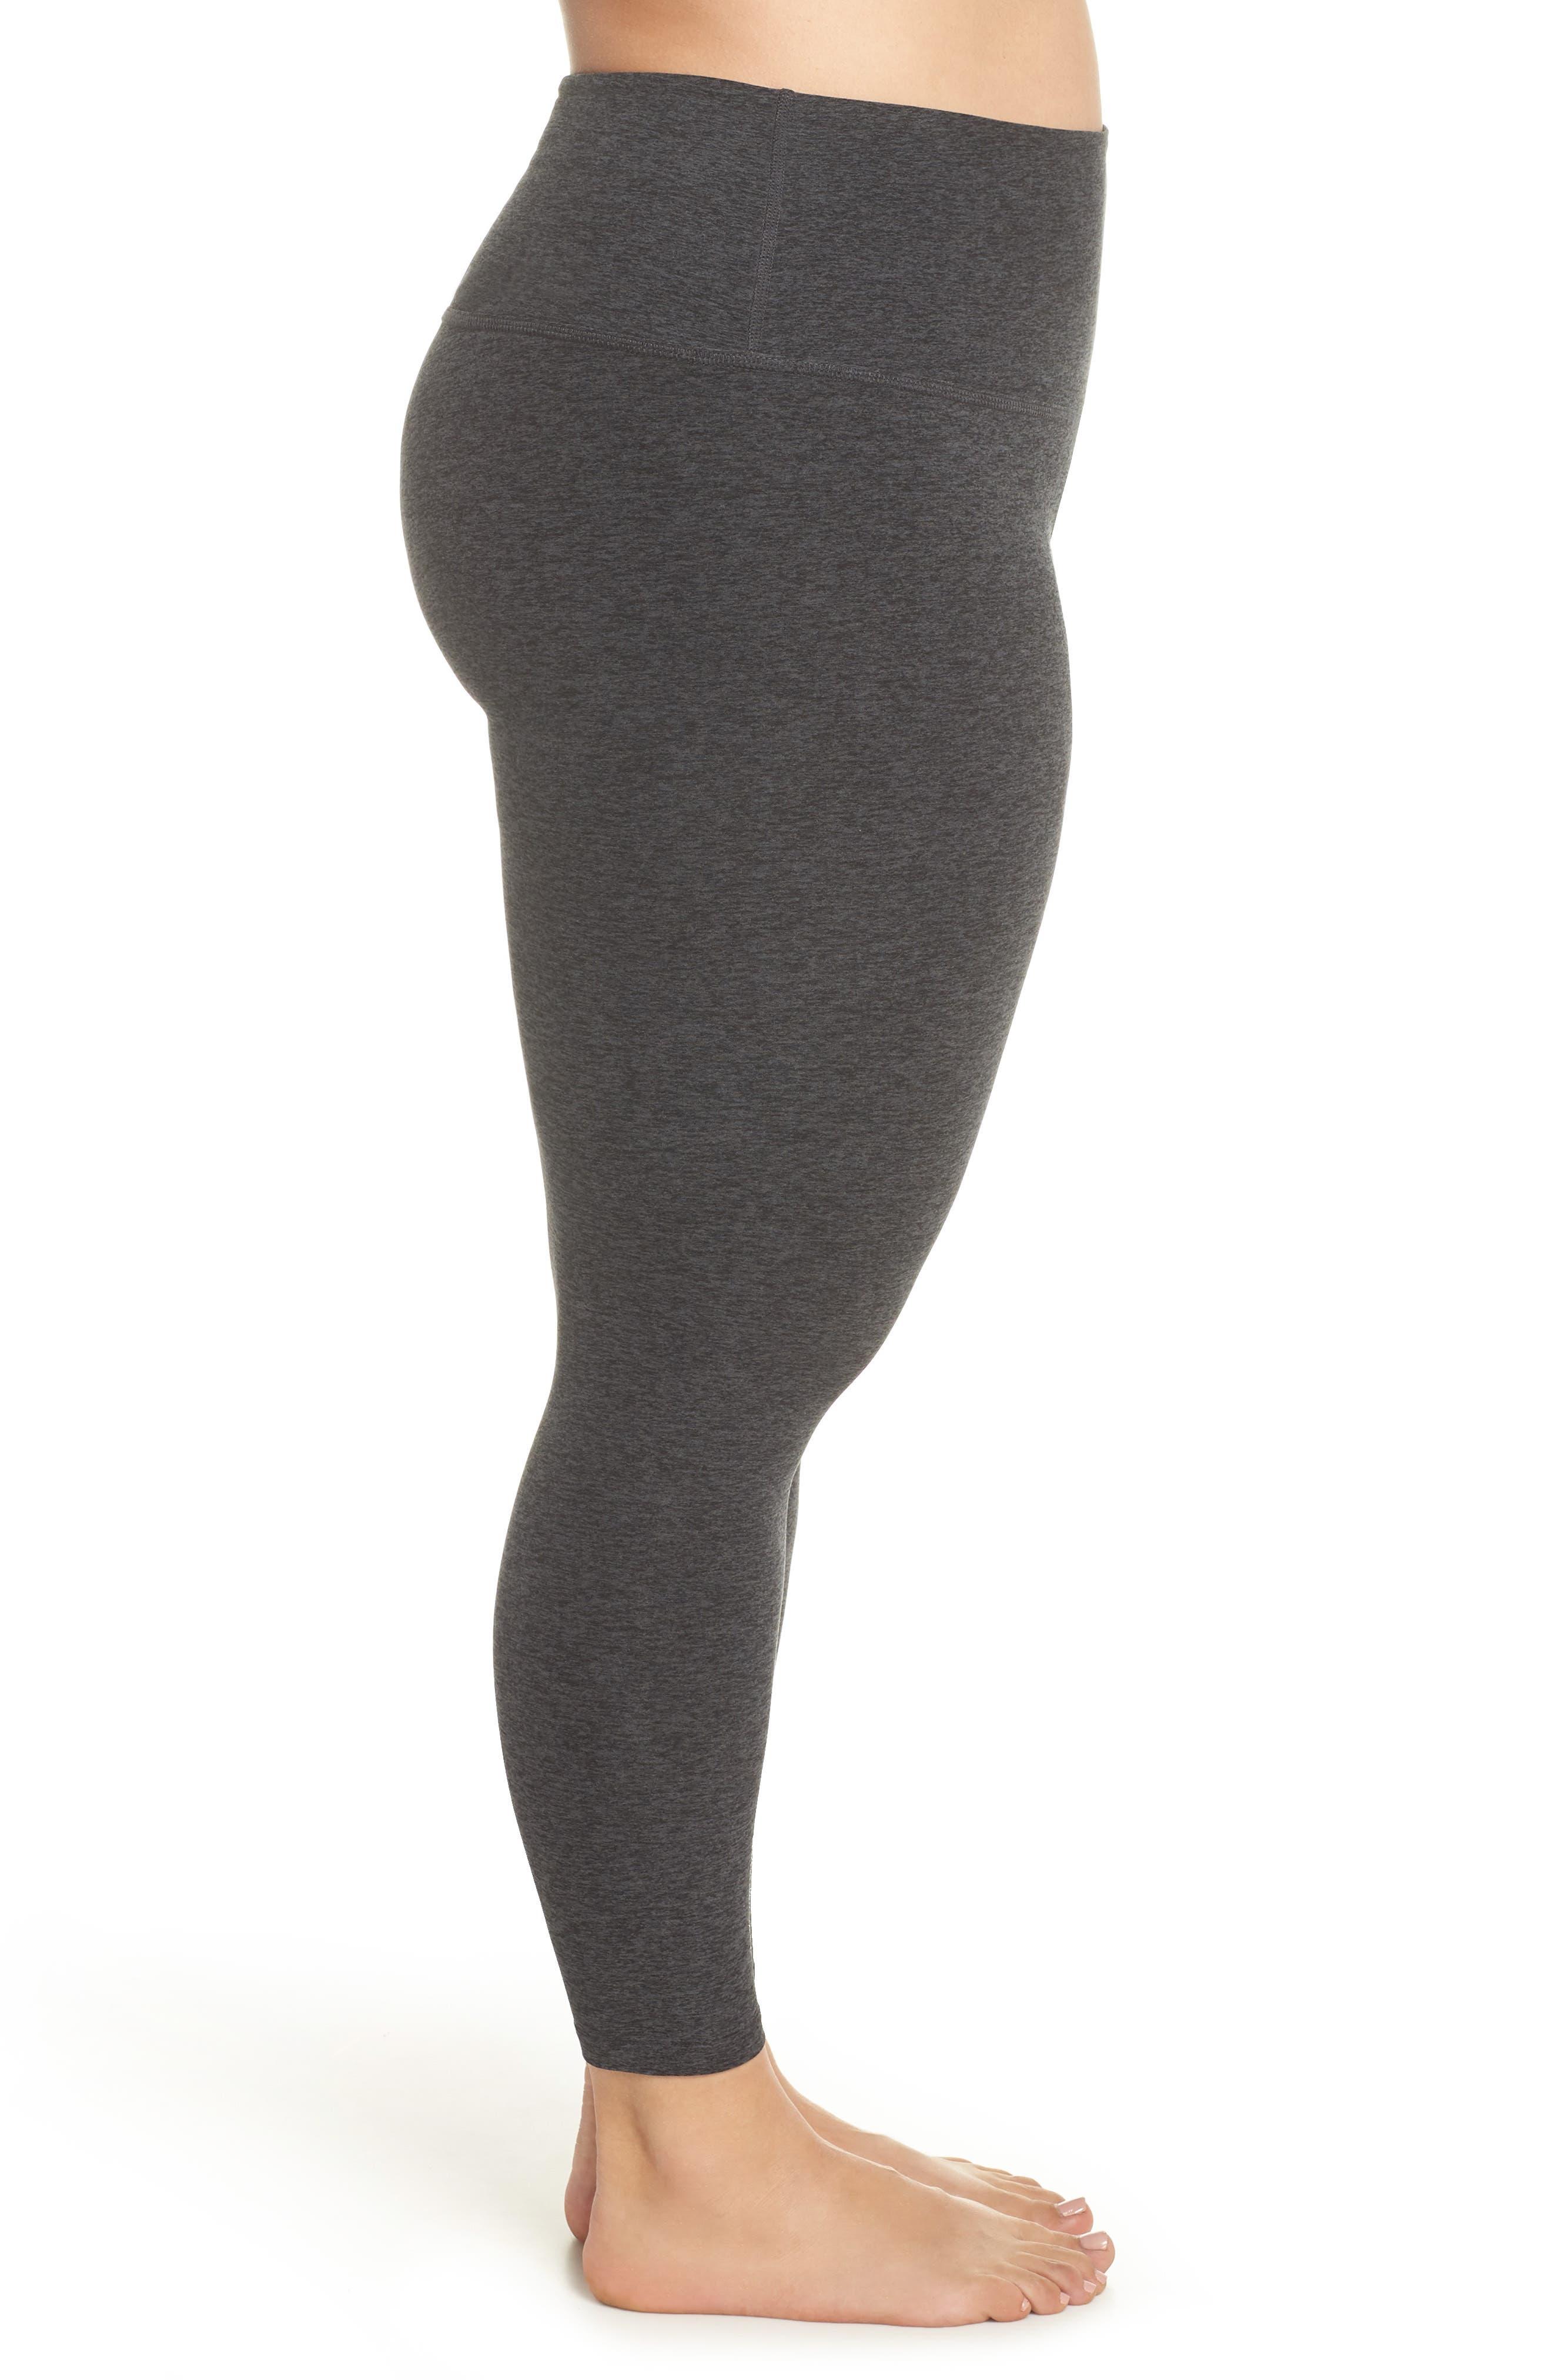 High Waist Midi Leggings,                             Alternate thumbnail 3, color,                             BLACK/ CHARCOAL